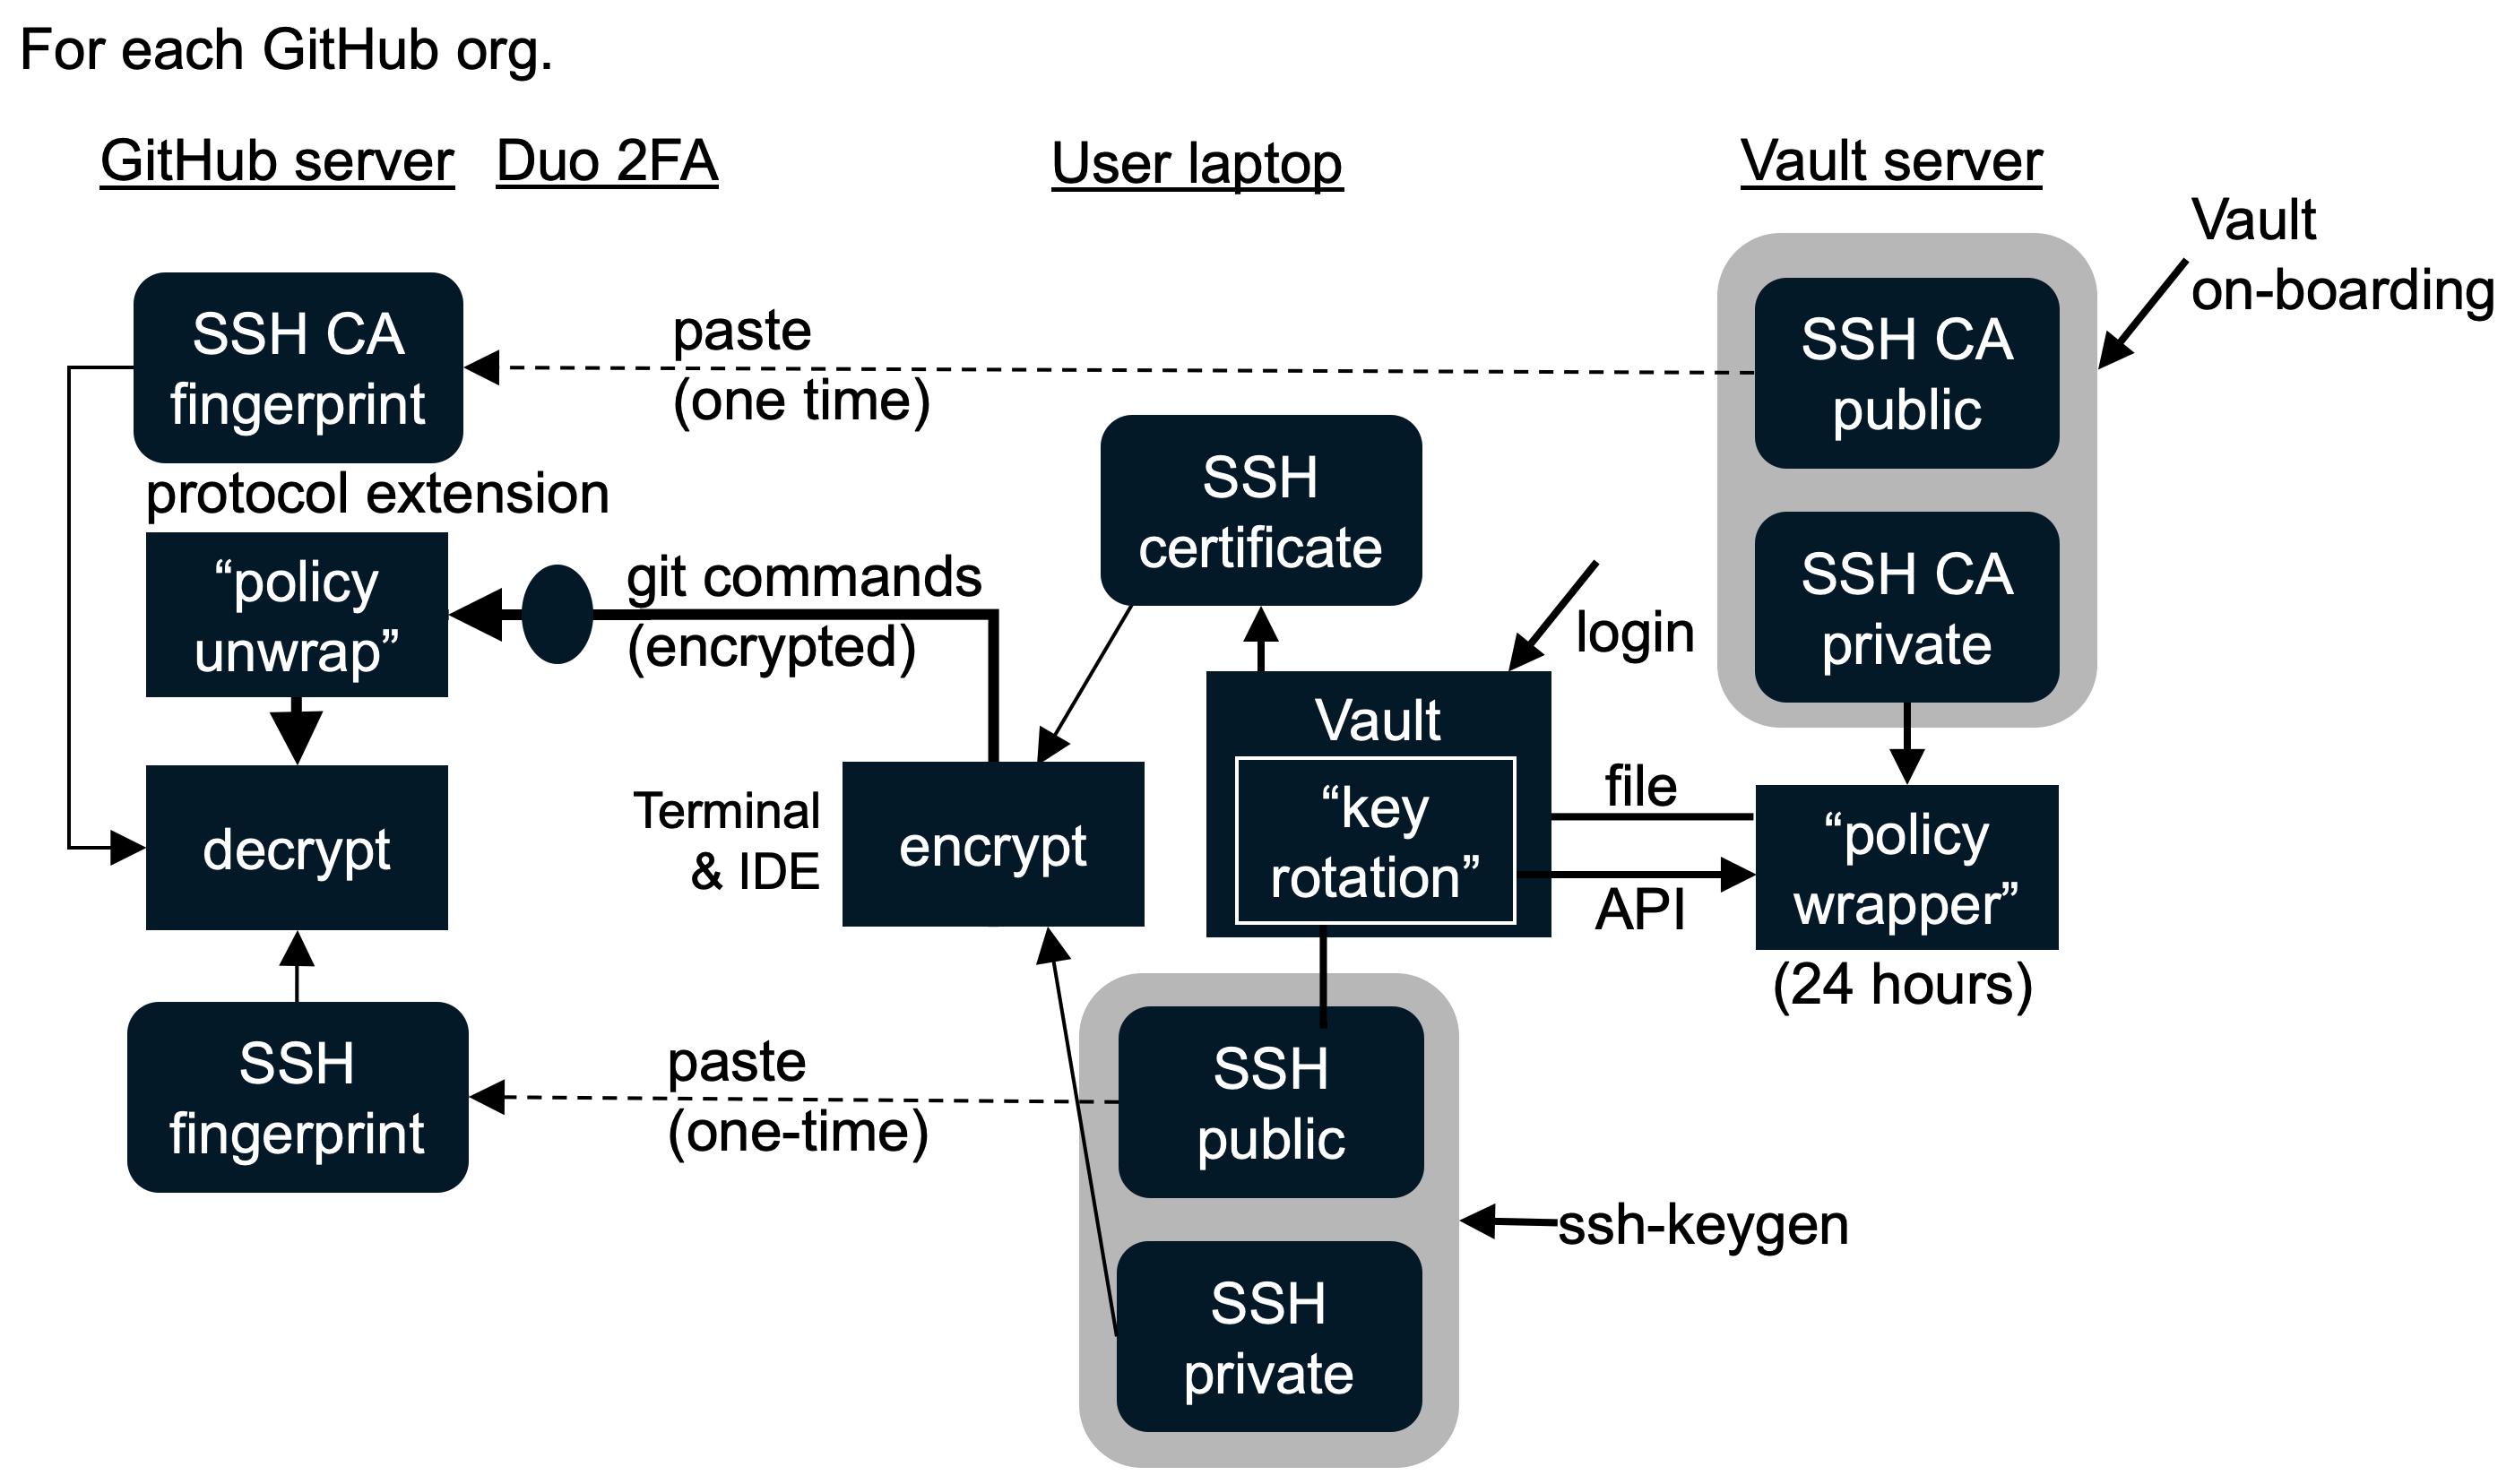 github-data-ssh-keyrotation-2806x1656